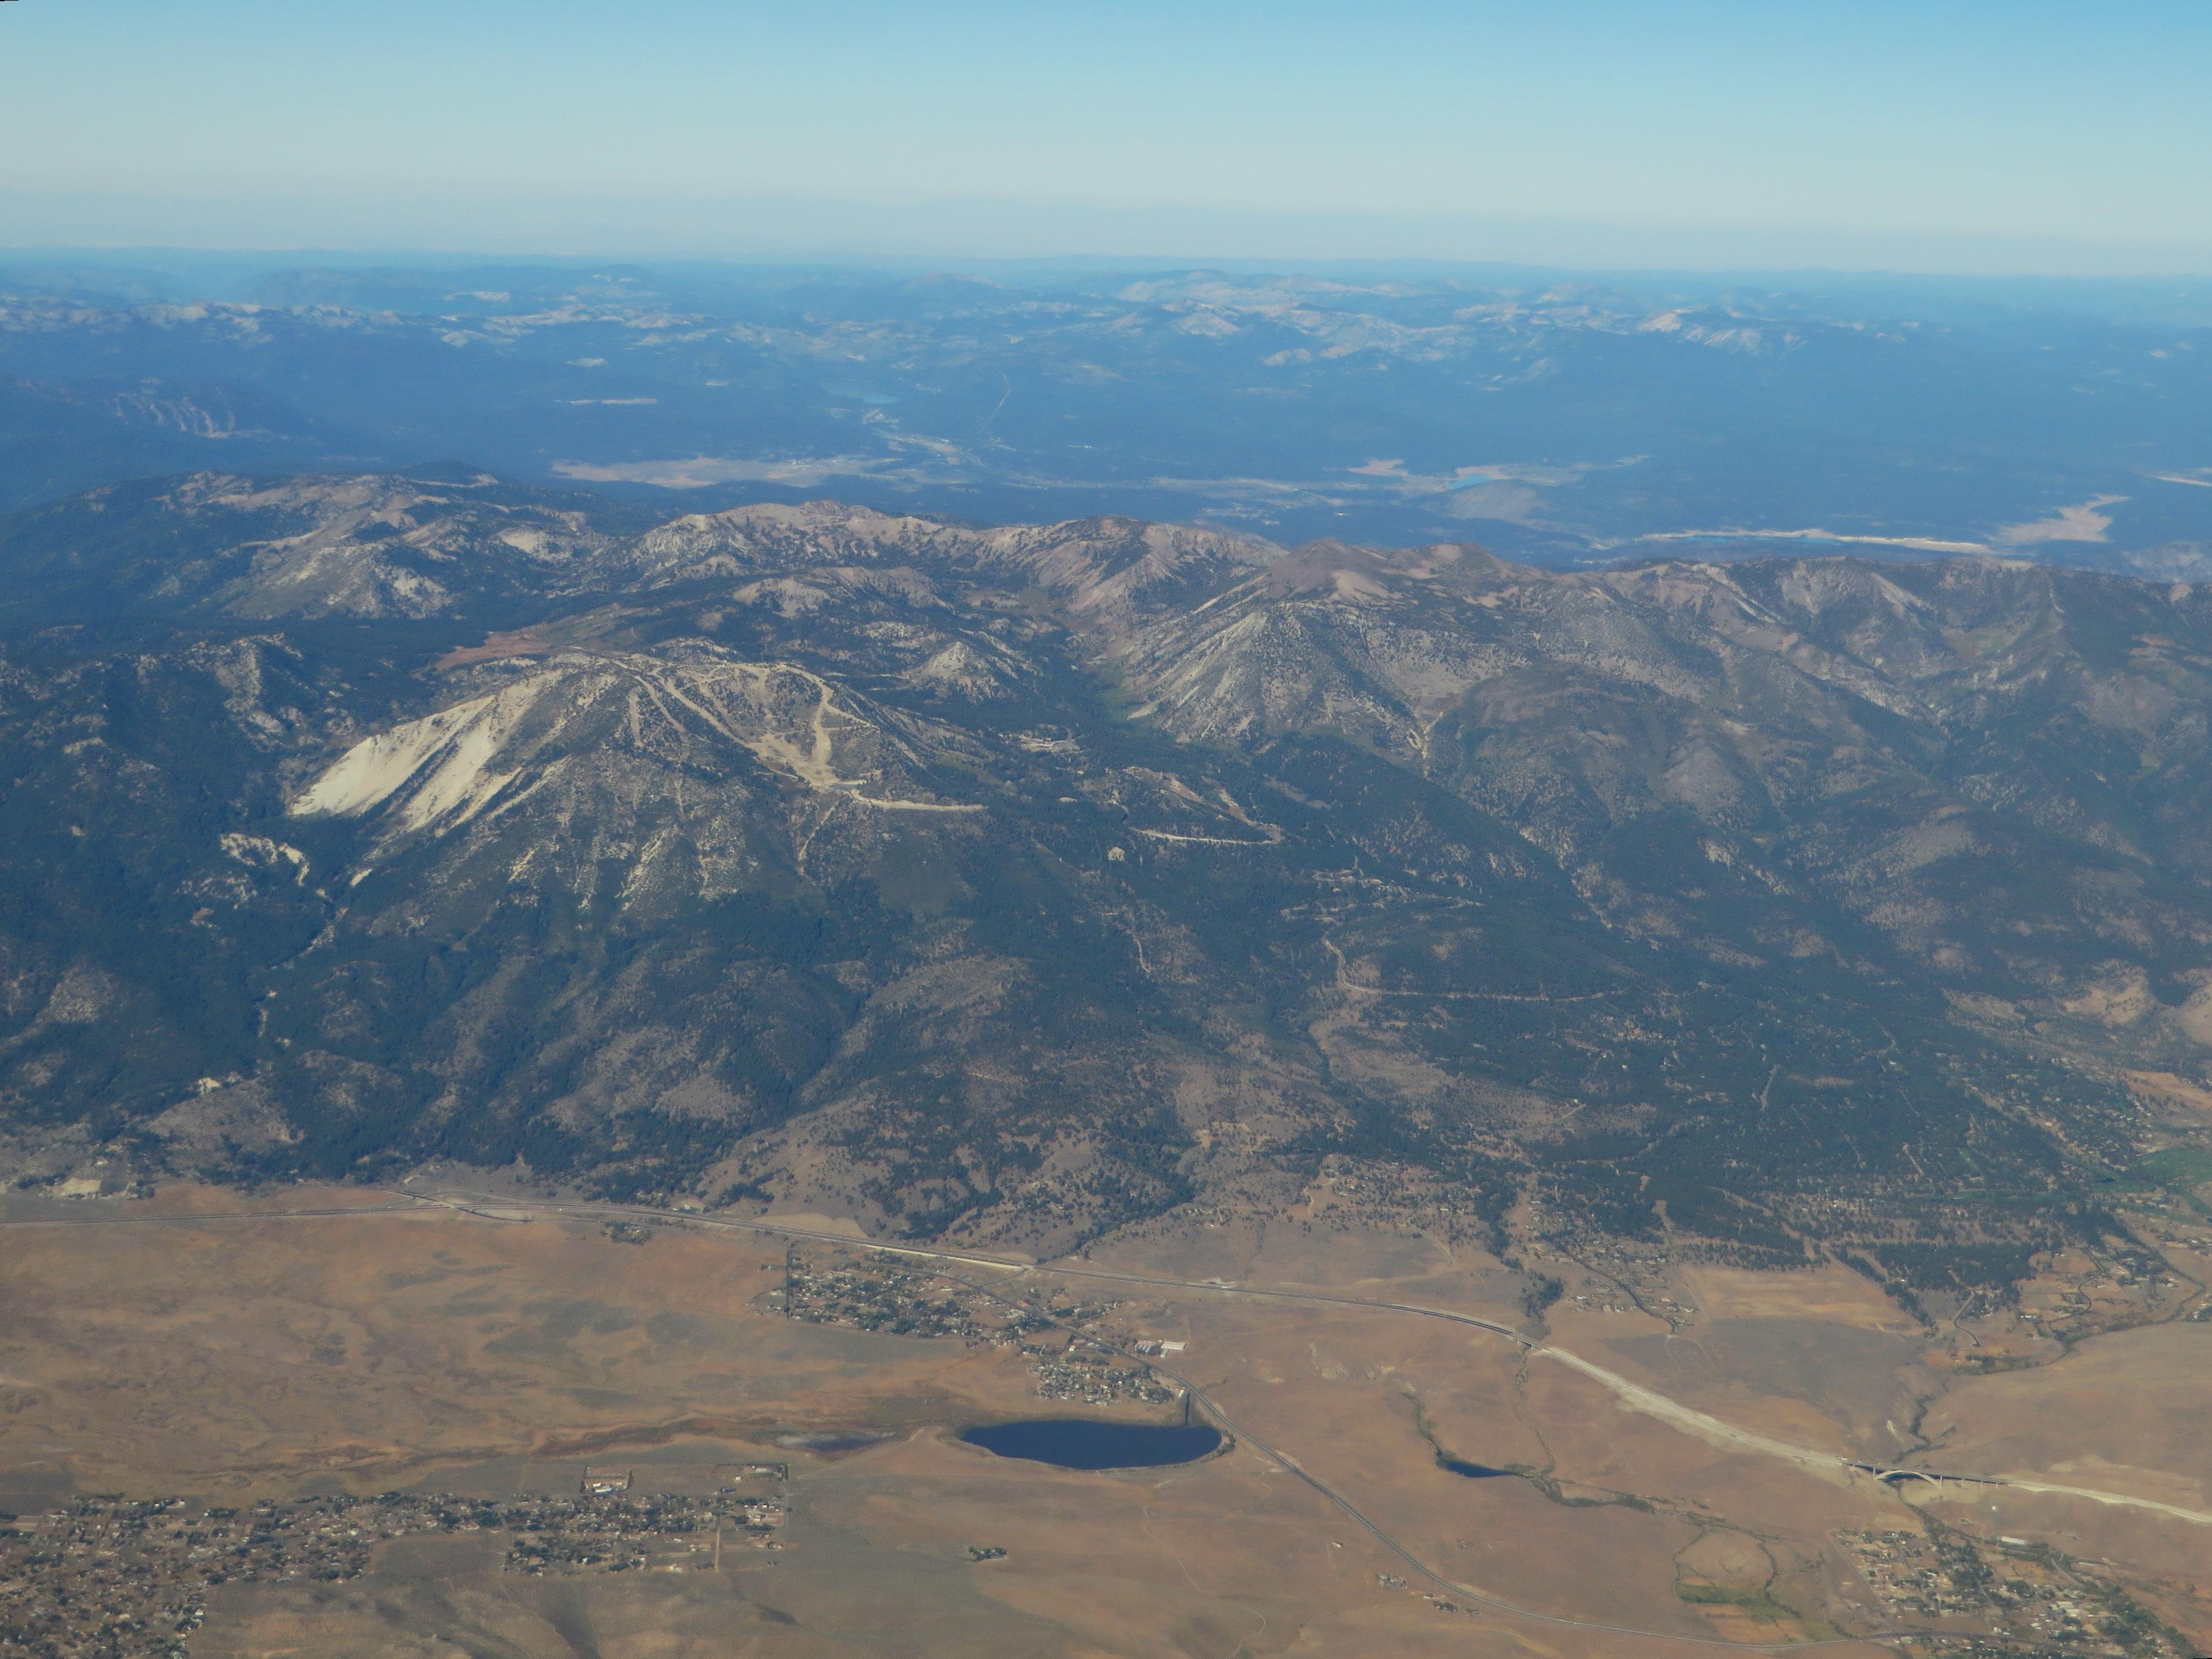 The Summit Reno >> File:Mount Rose, Slide Mountain, and Washoe Valley Near Reno, Nevada (21383914740).jpg ...